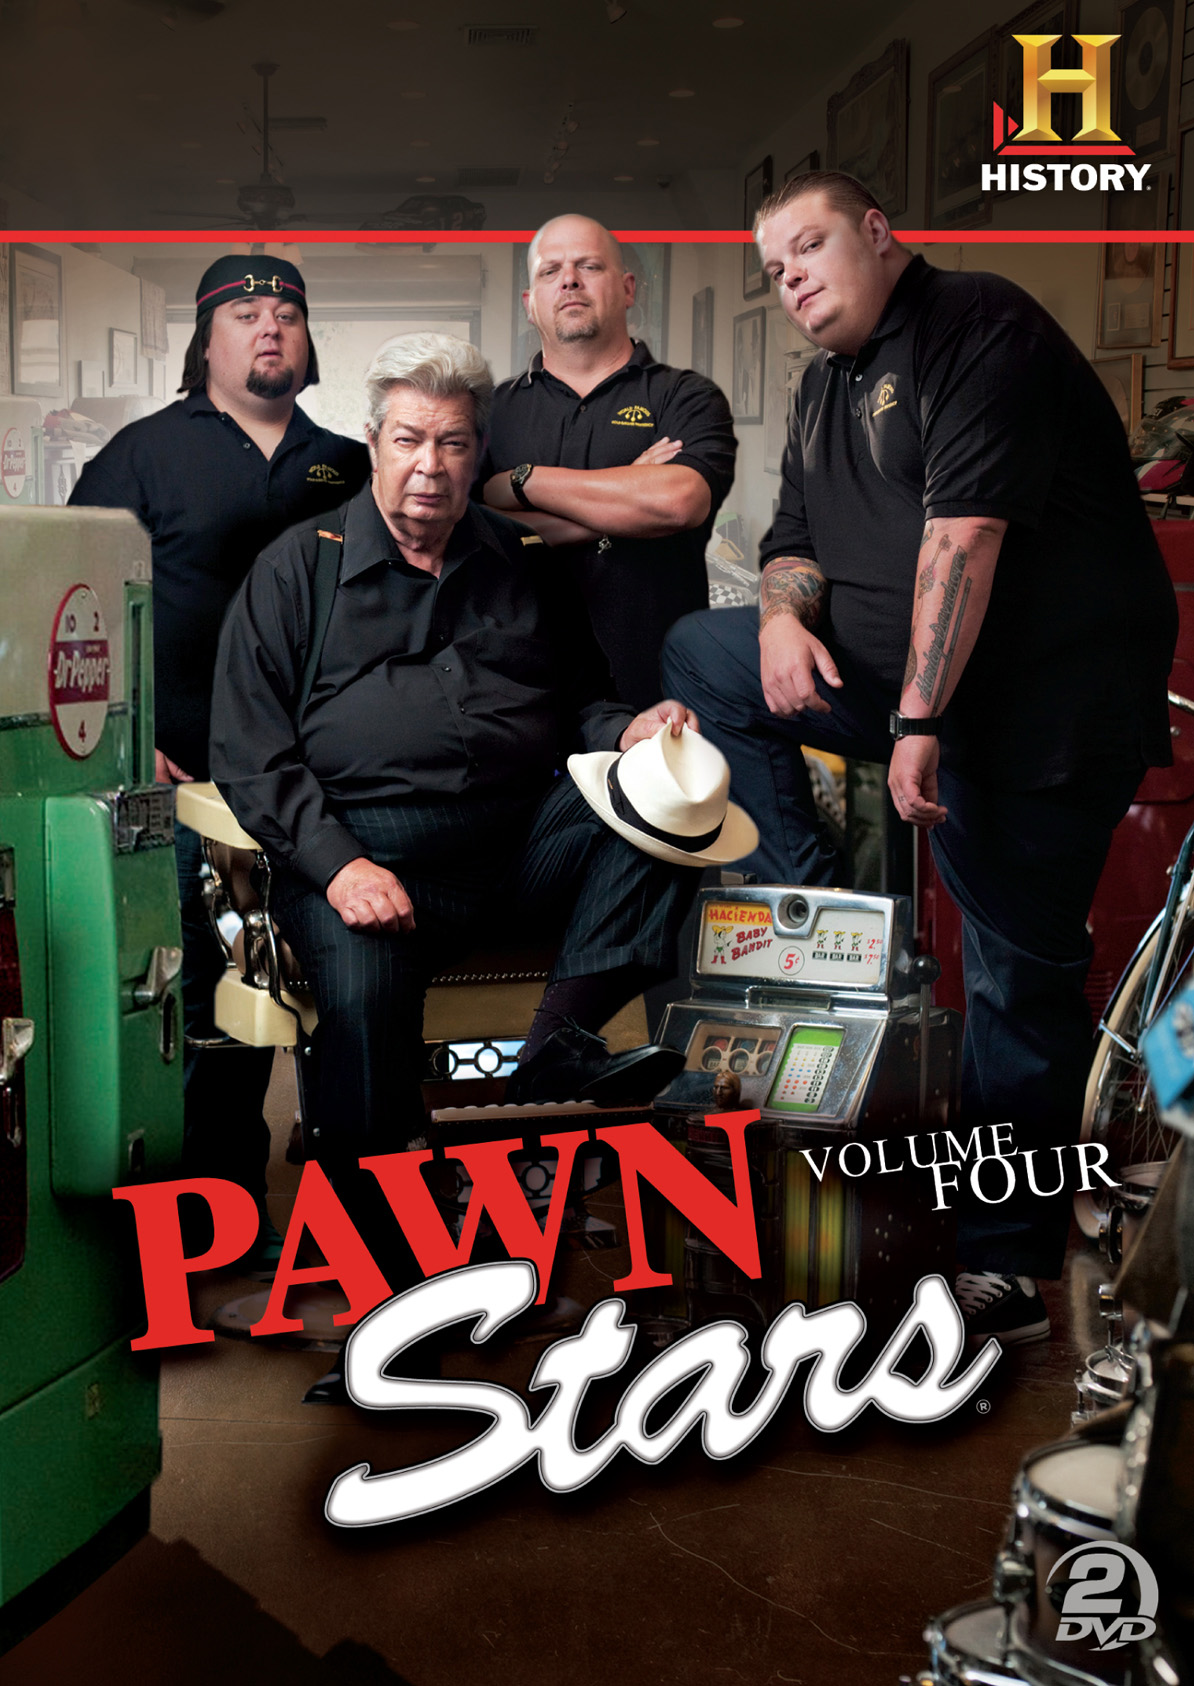 Harrison Pawn Stars